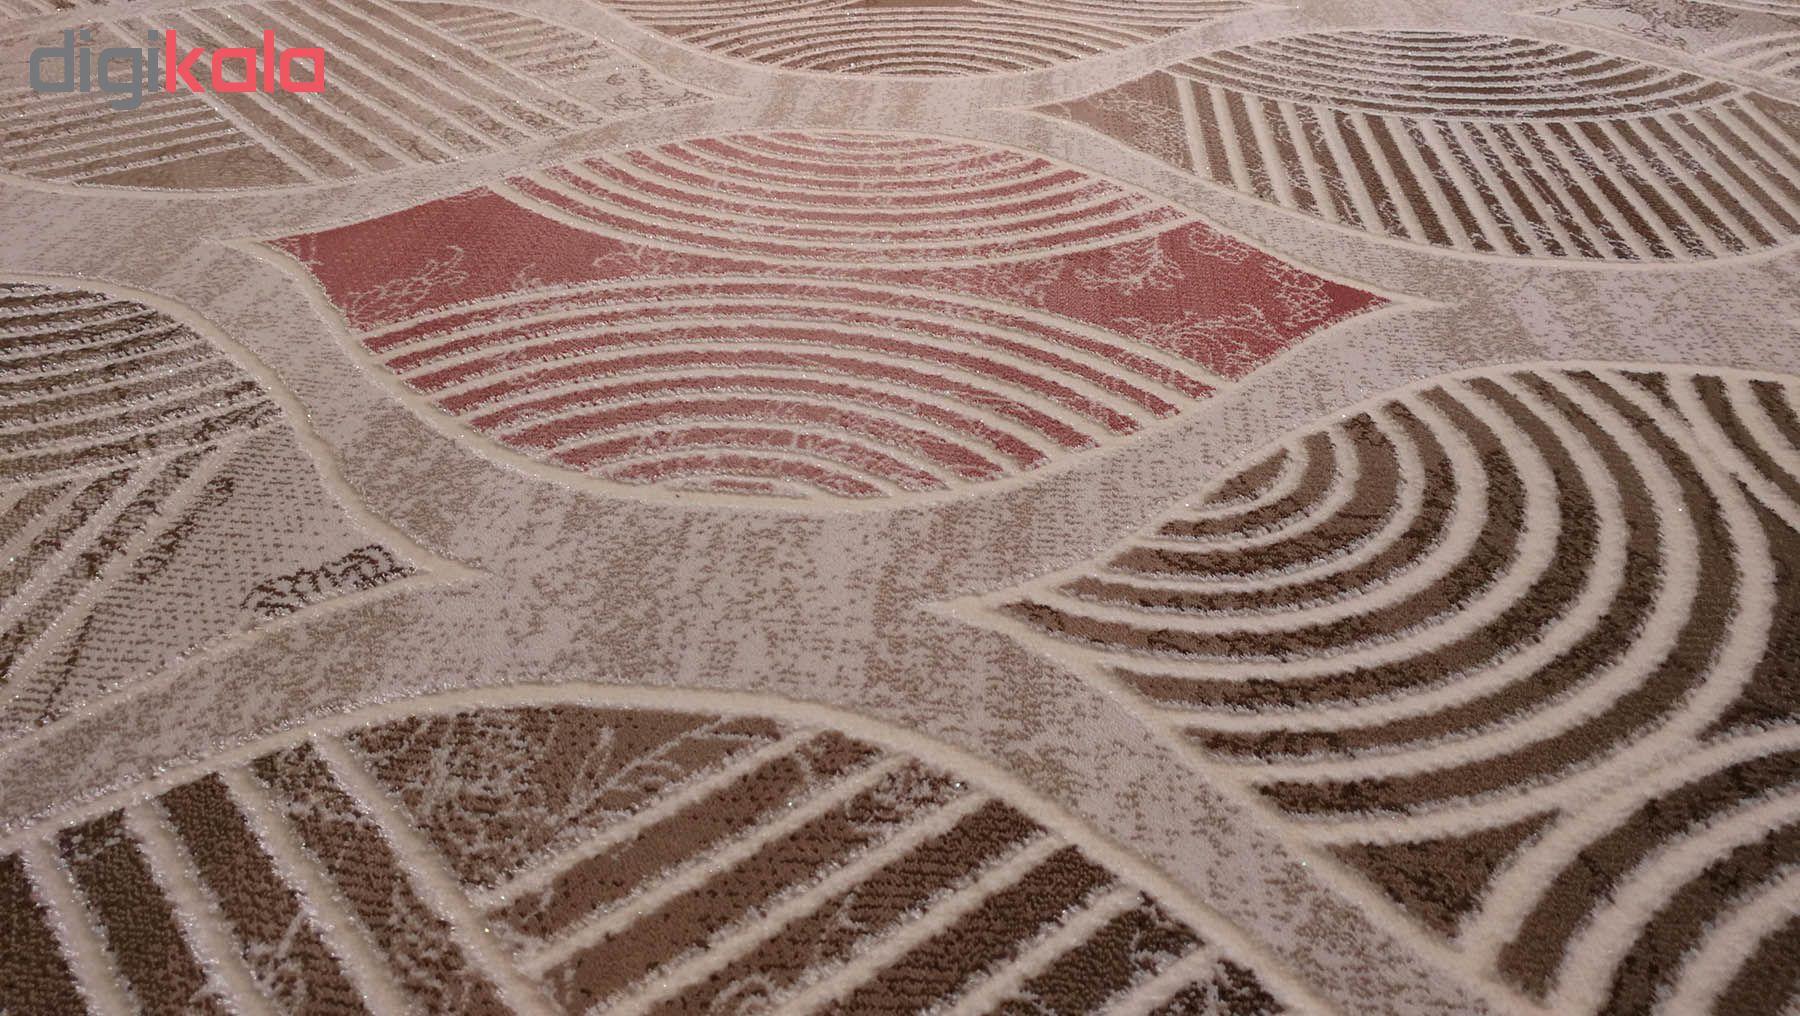 فرش ماشینی زمرد مشهد کد KR31 زمینه کرم صورتی